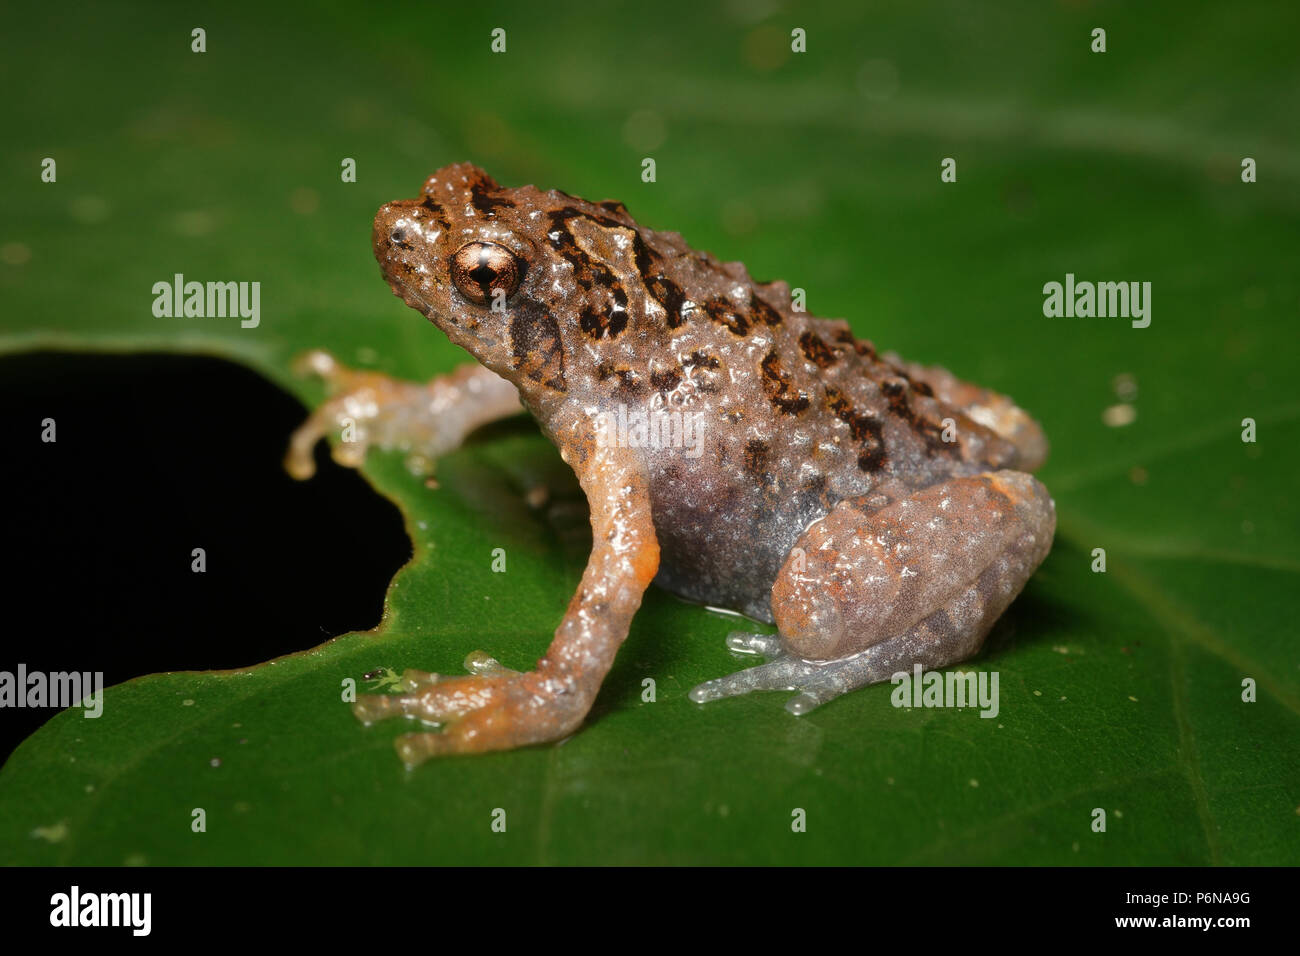 Bornean treehole frog Metaphrynella sundana - Stock Image